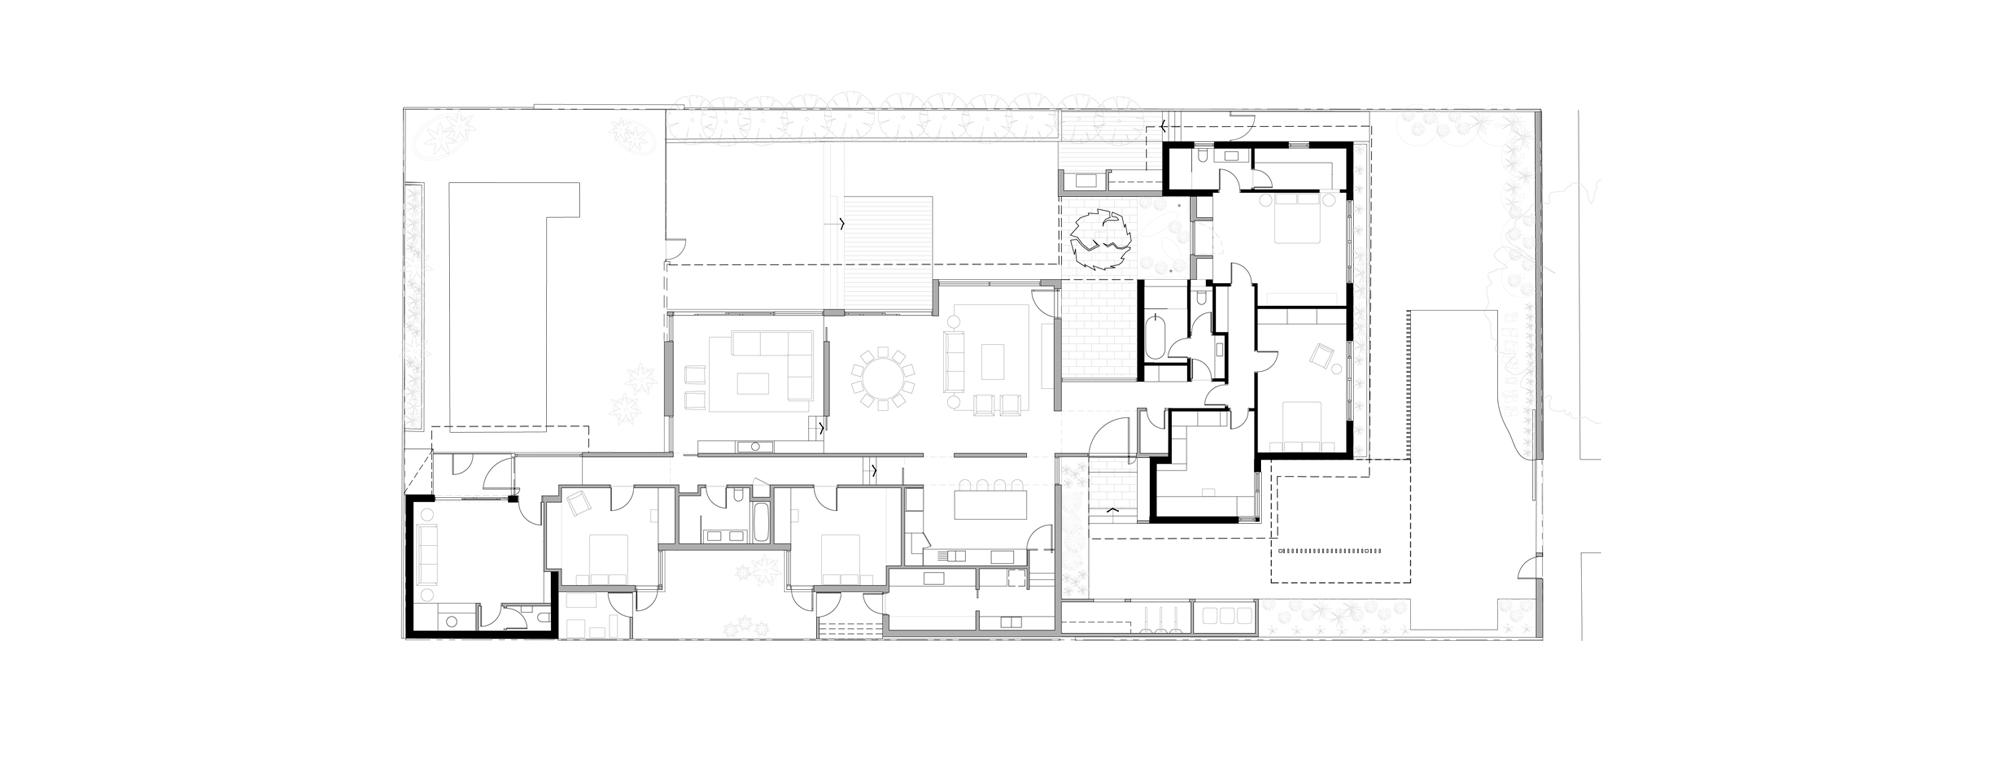 Bower-Kates-House-Plan